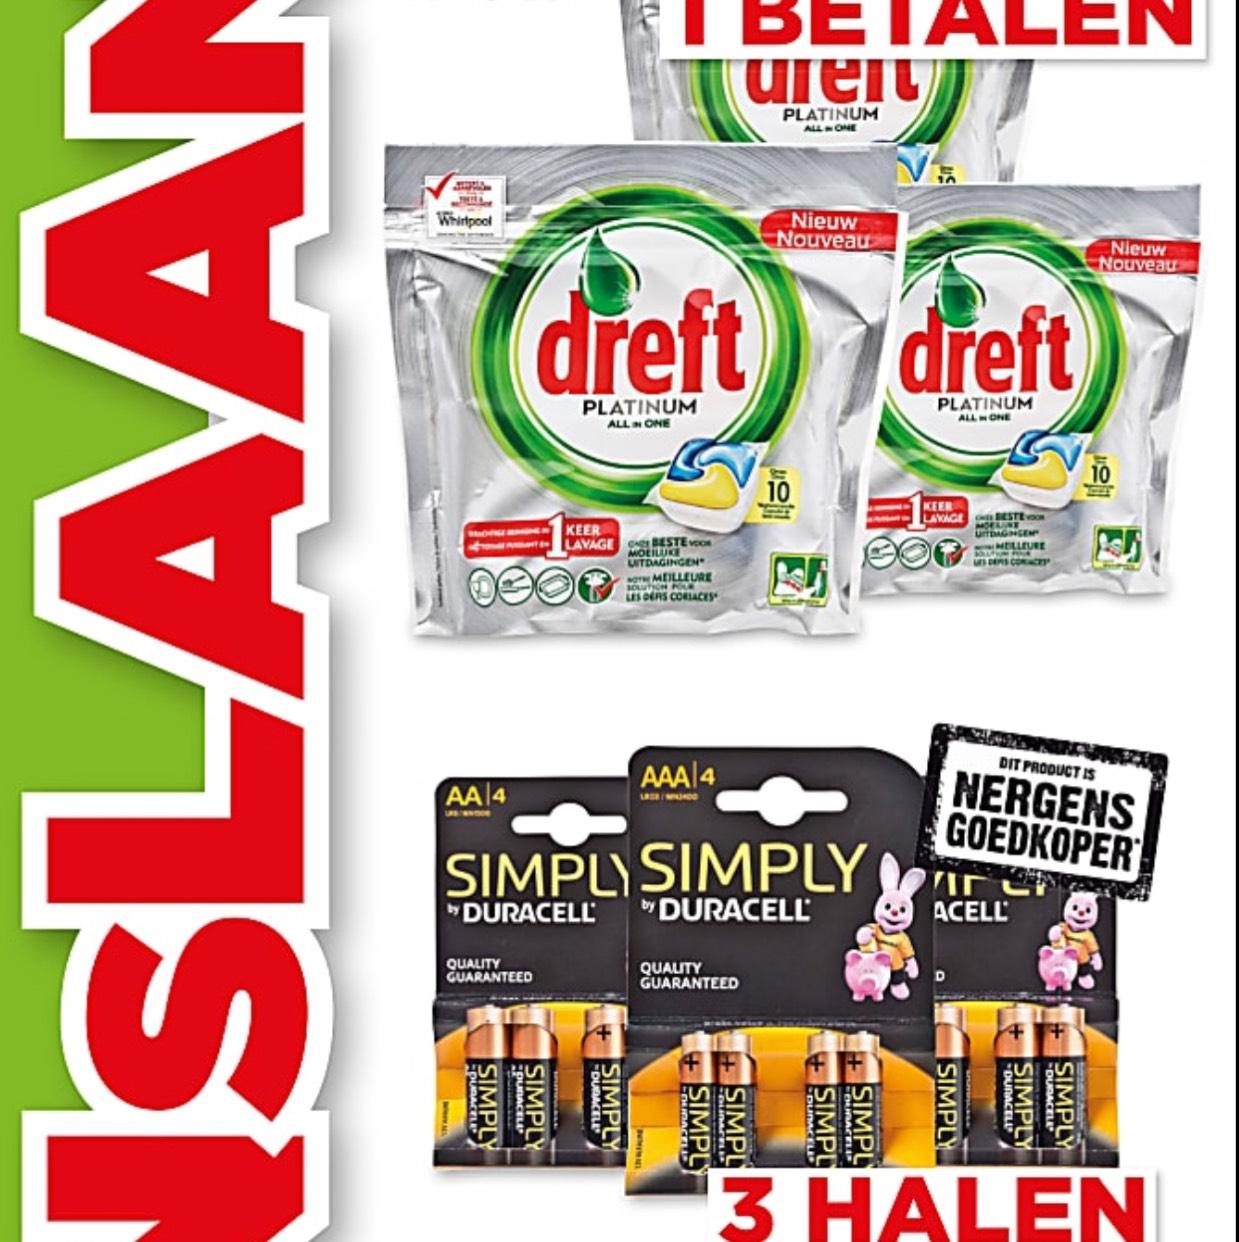 3 Halen 1 betalen op DREFT + DURACELL BATTERIJEN + DOVE @ PLUS